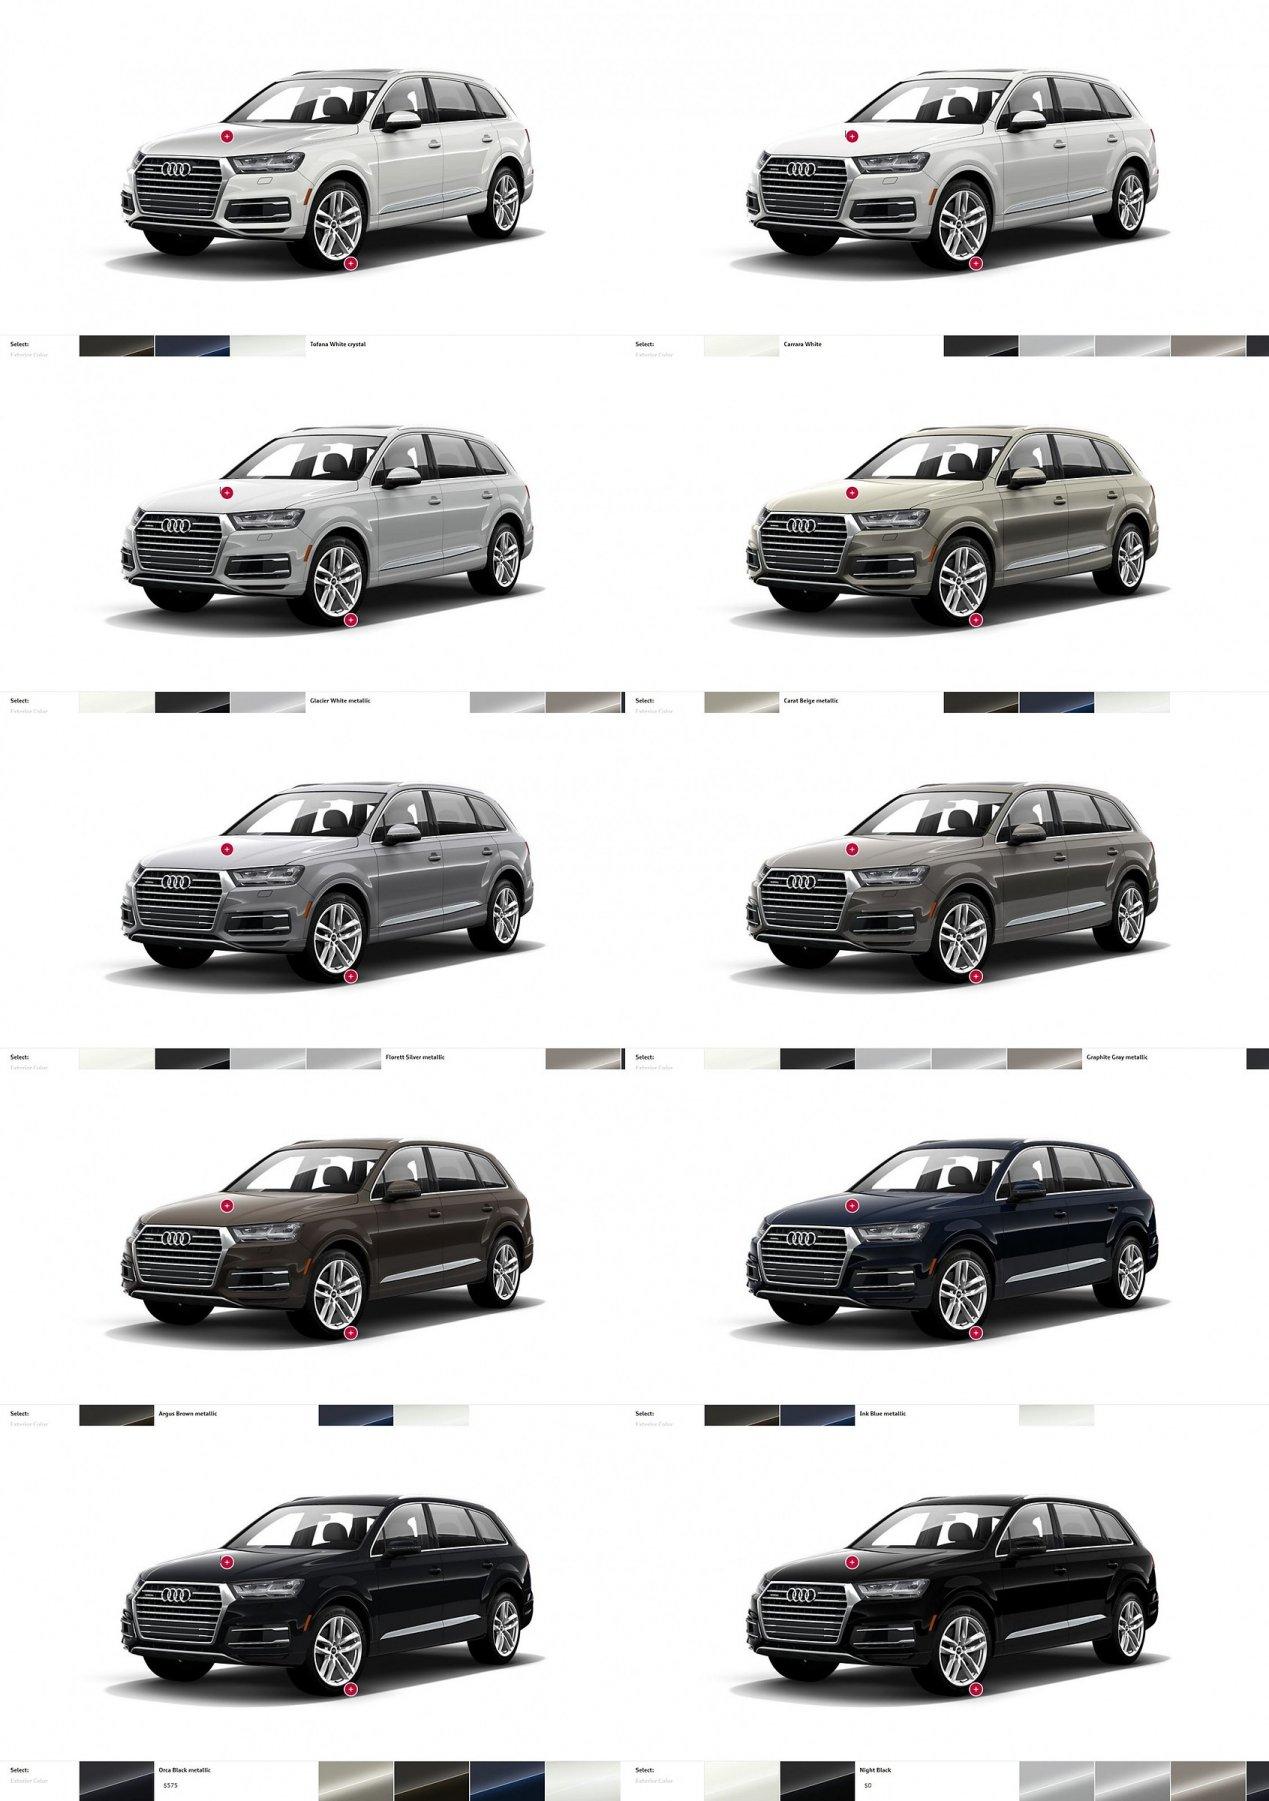 Audi Q7 Colors Wheels And Interiors 12 Tile